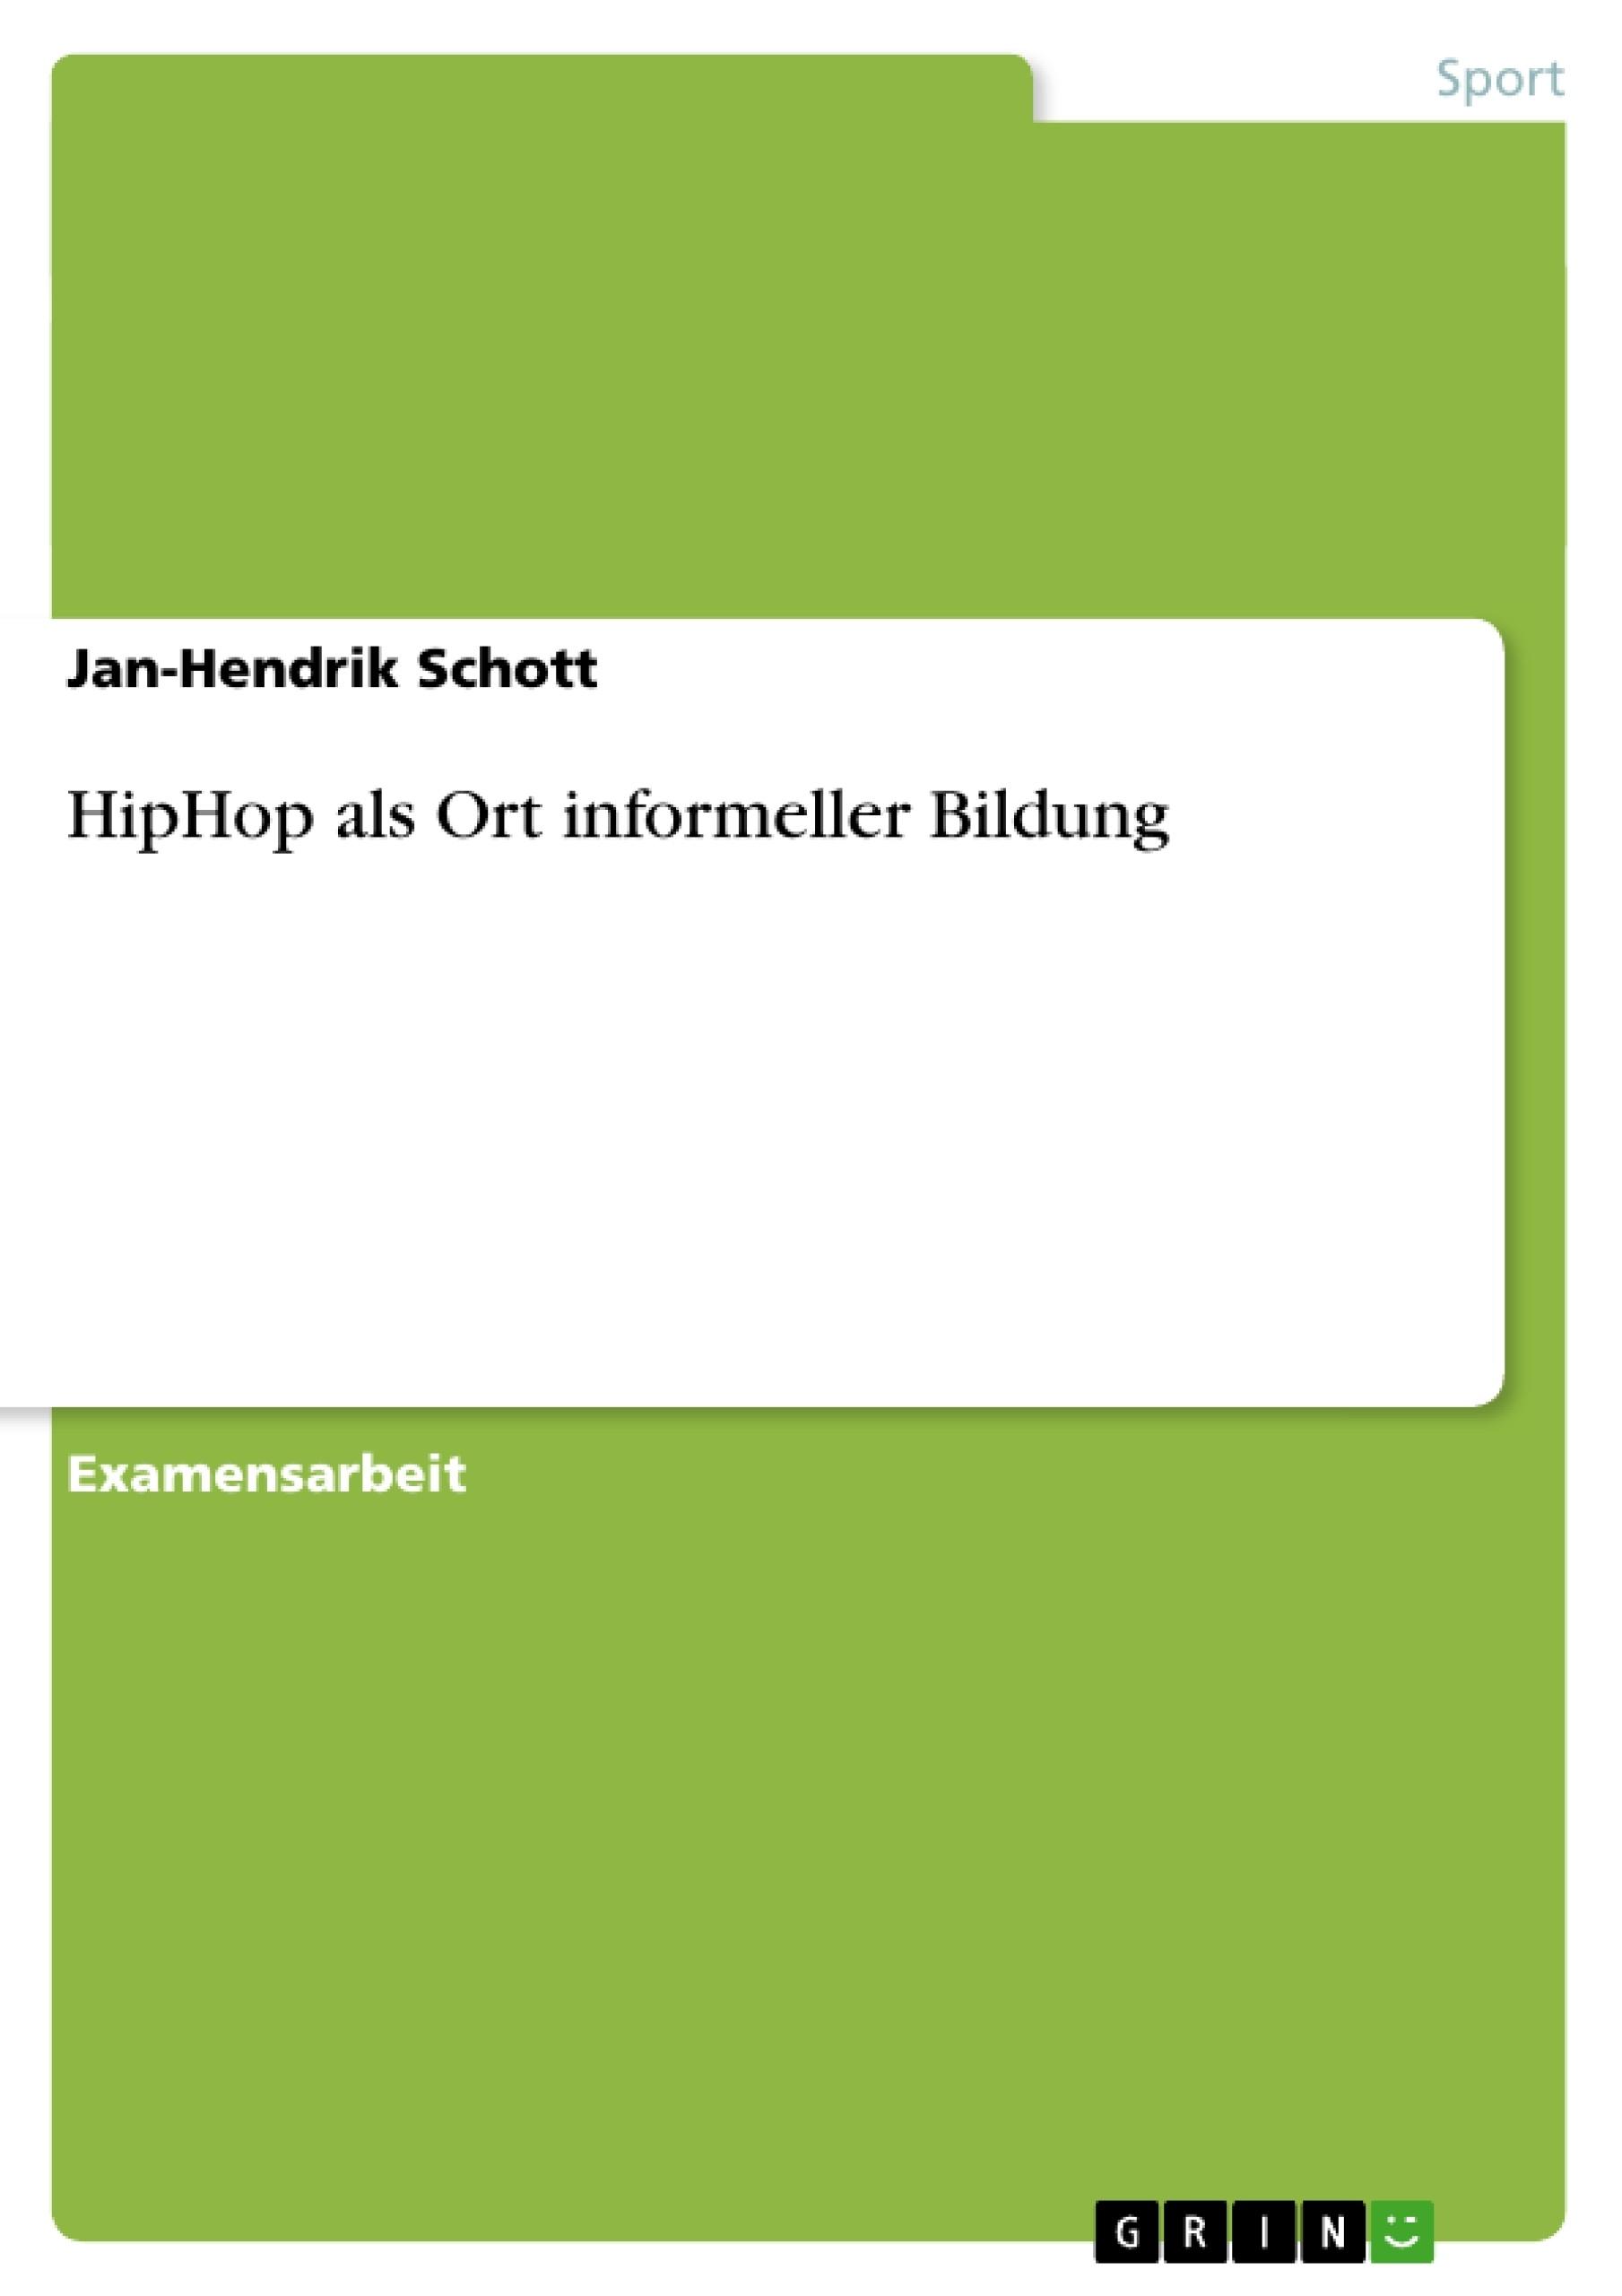 Titel: HipHop als Ort informeller Bildung